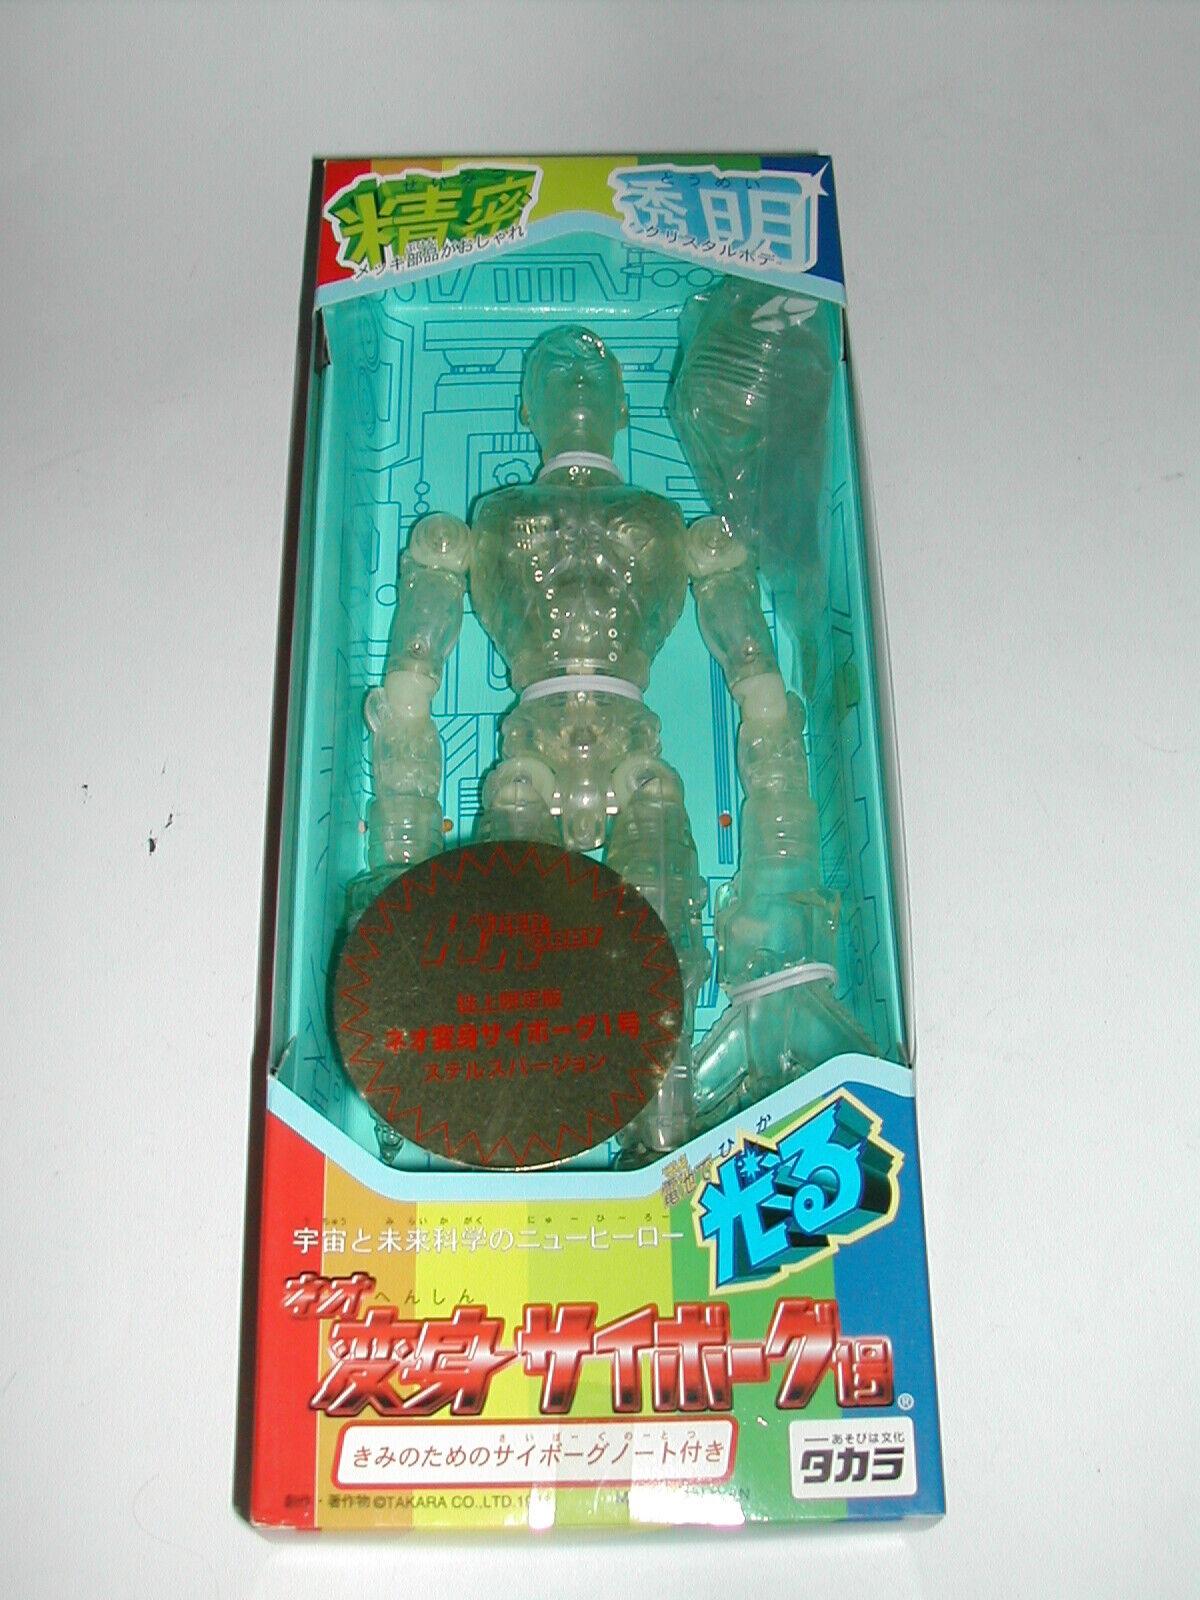 HYPER HOBBY esclusivo via mail TAKARA CLEAR Henshin Cyborg mutoni Android